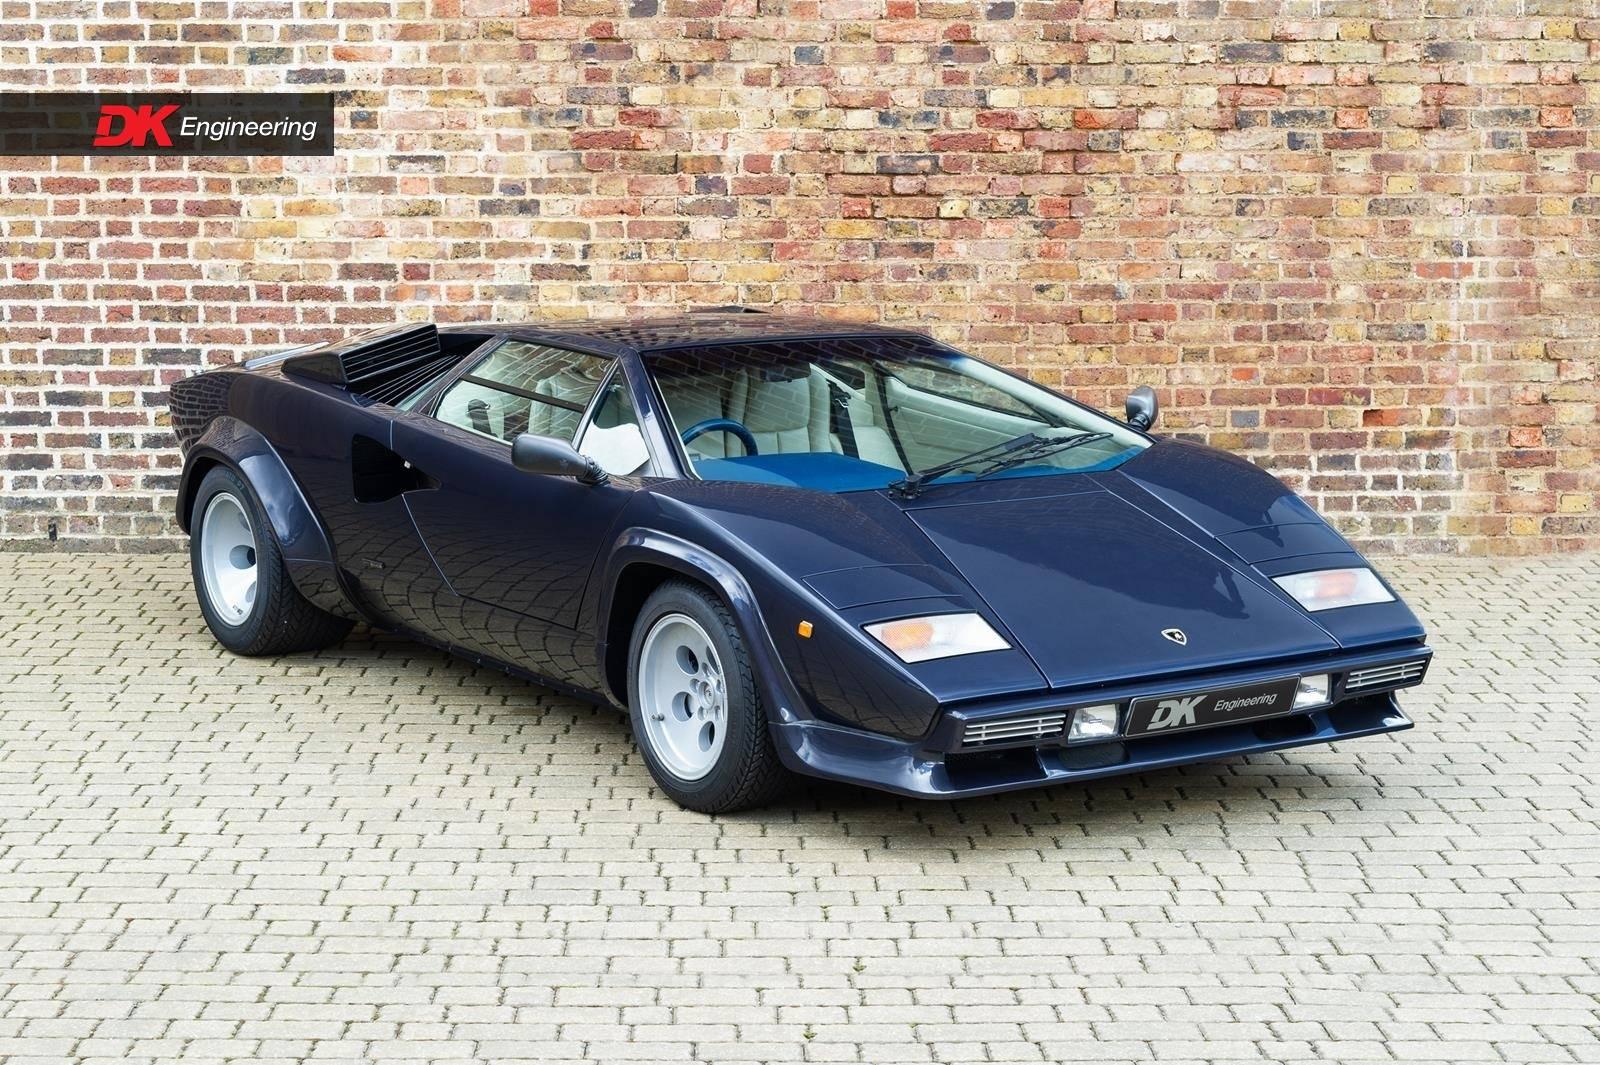 For Sale: Lamborghini Countach LP 5000 QV (1986) offered for GBP 464.995